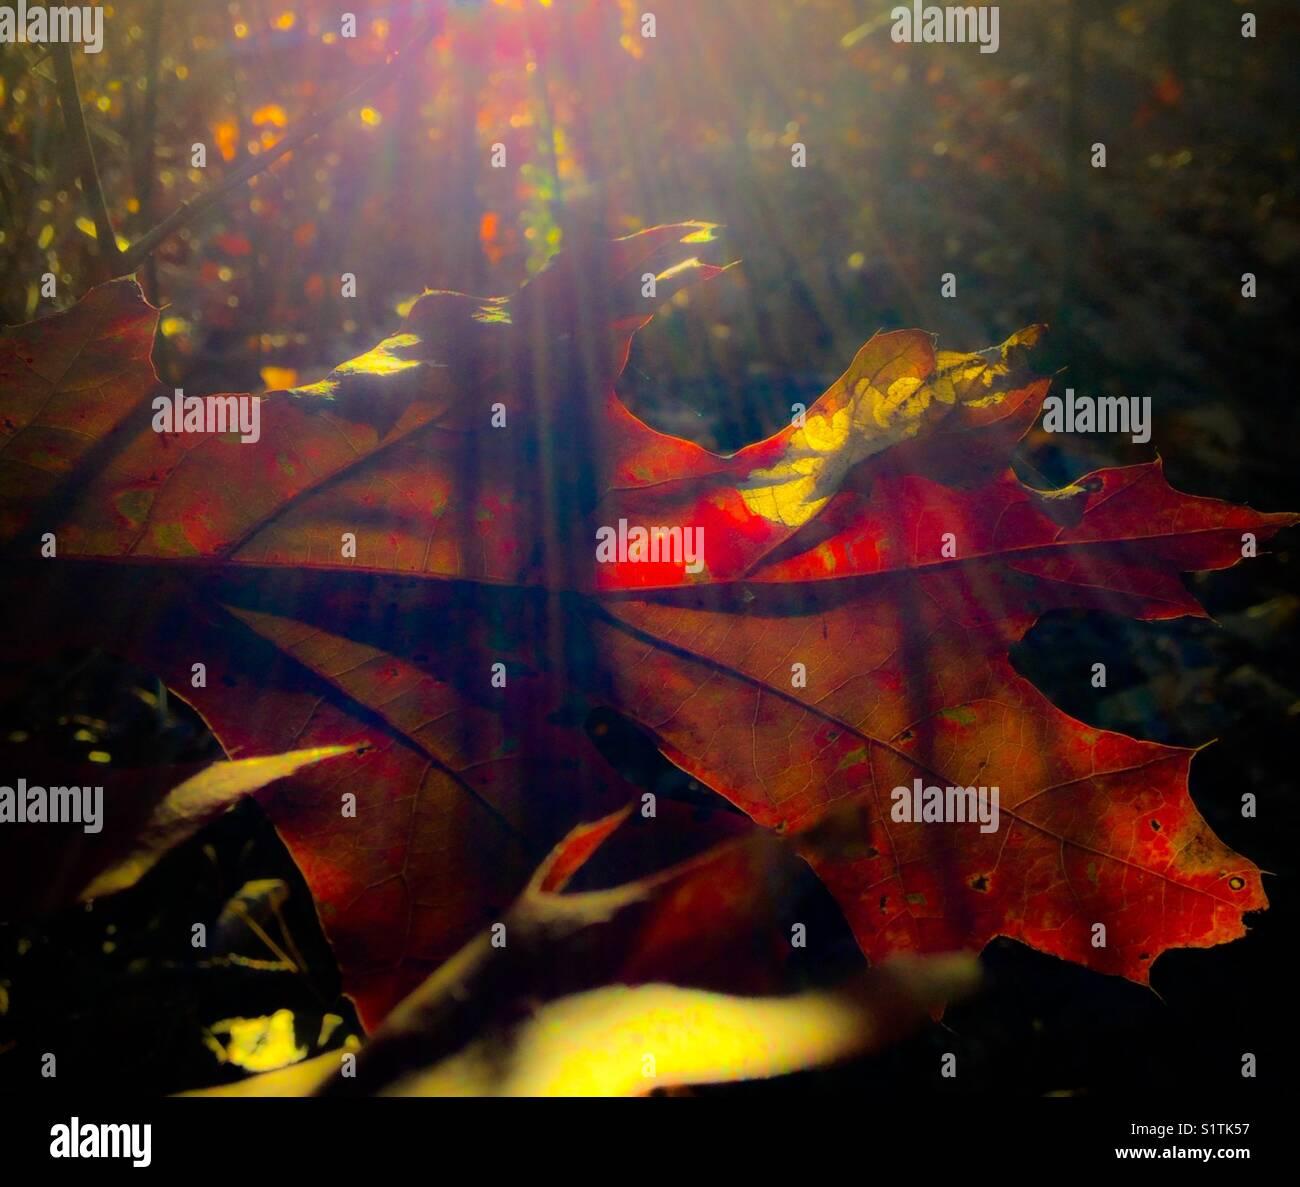 Jewel toned leaf with sunbeams - Stock Image